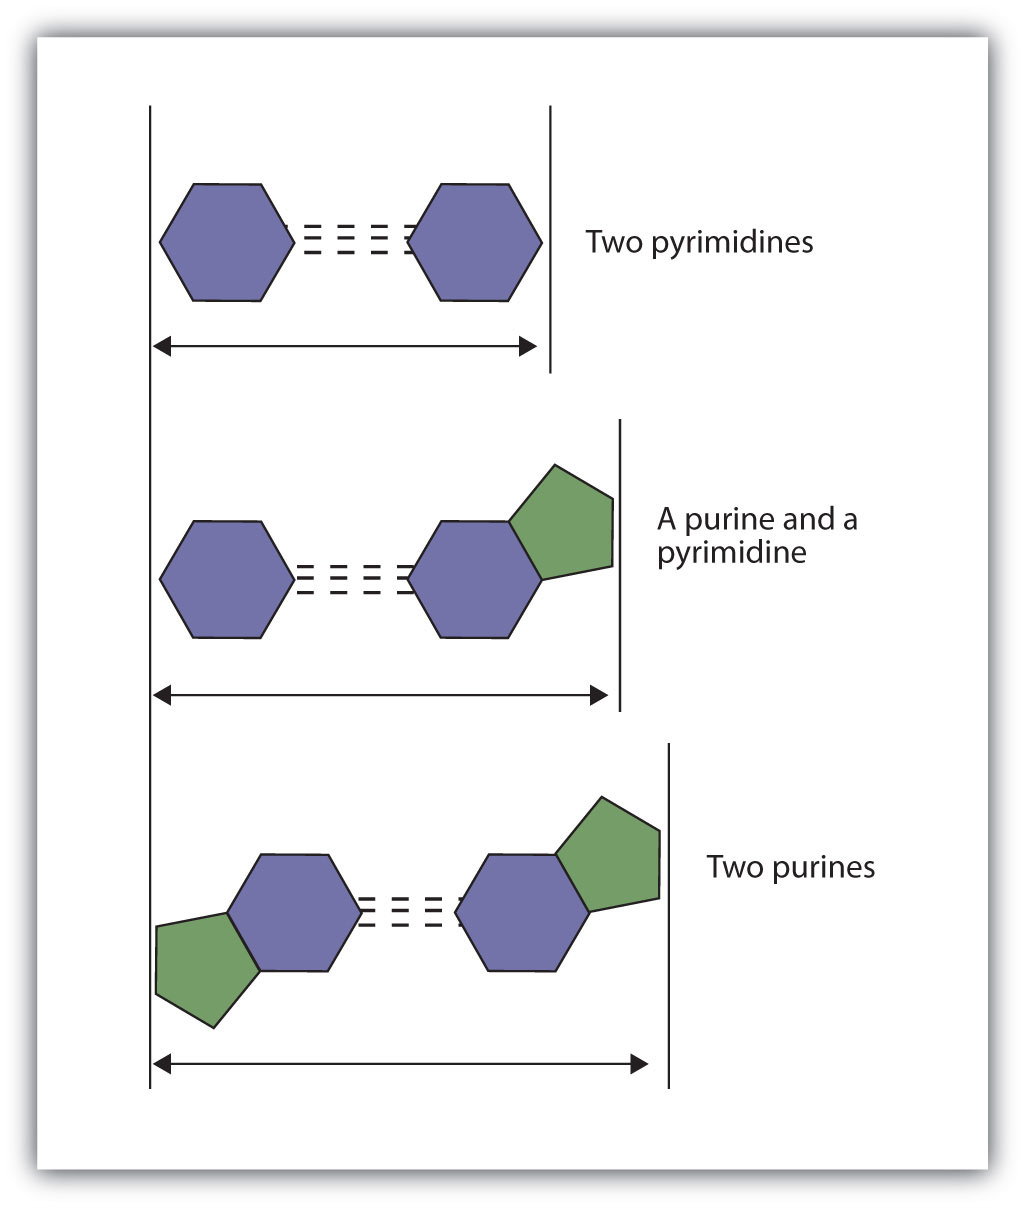 19 2 Nucleic Acid Structure